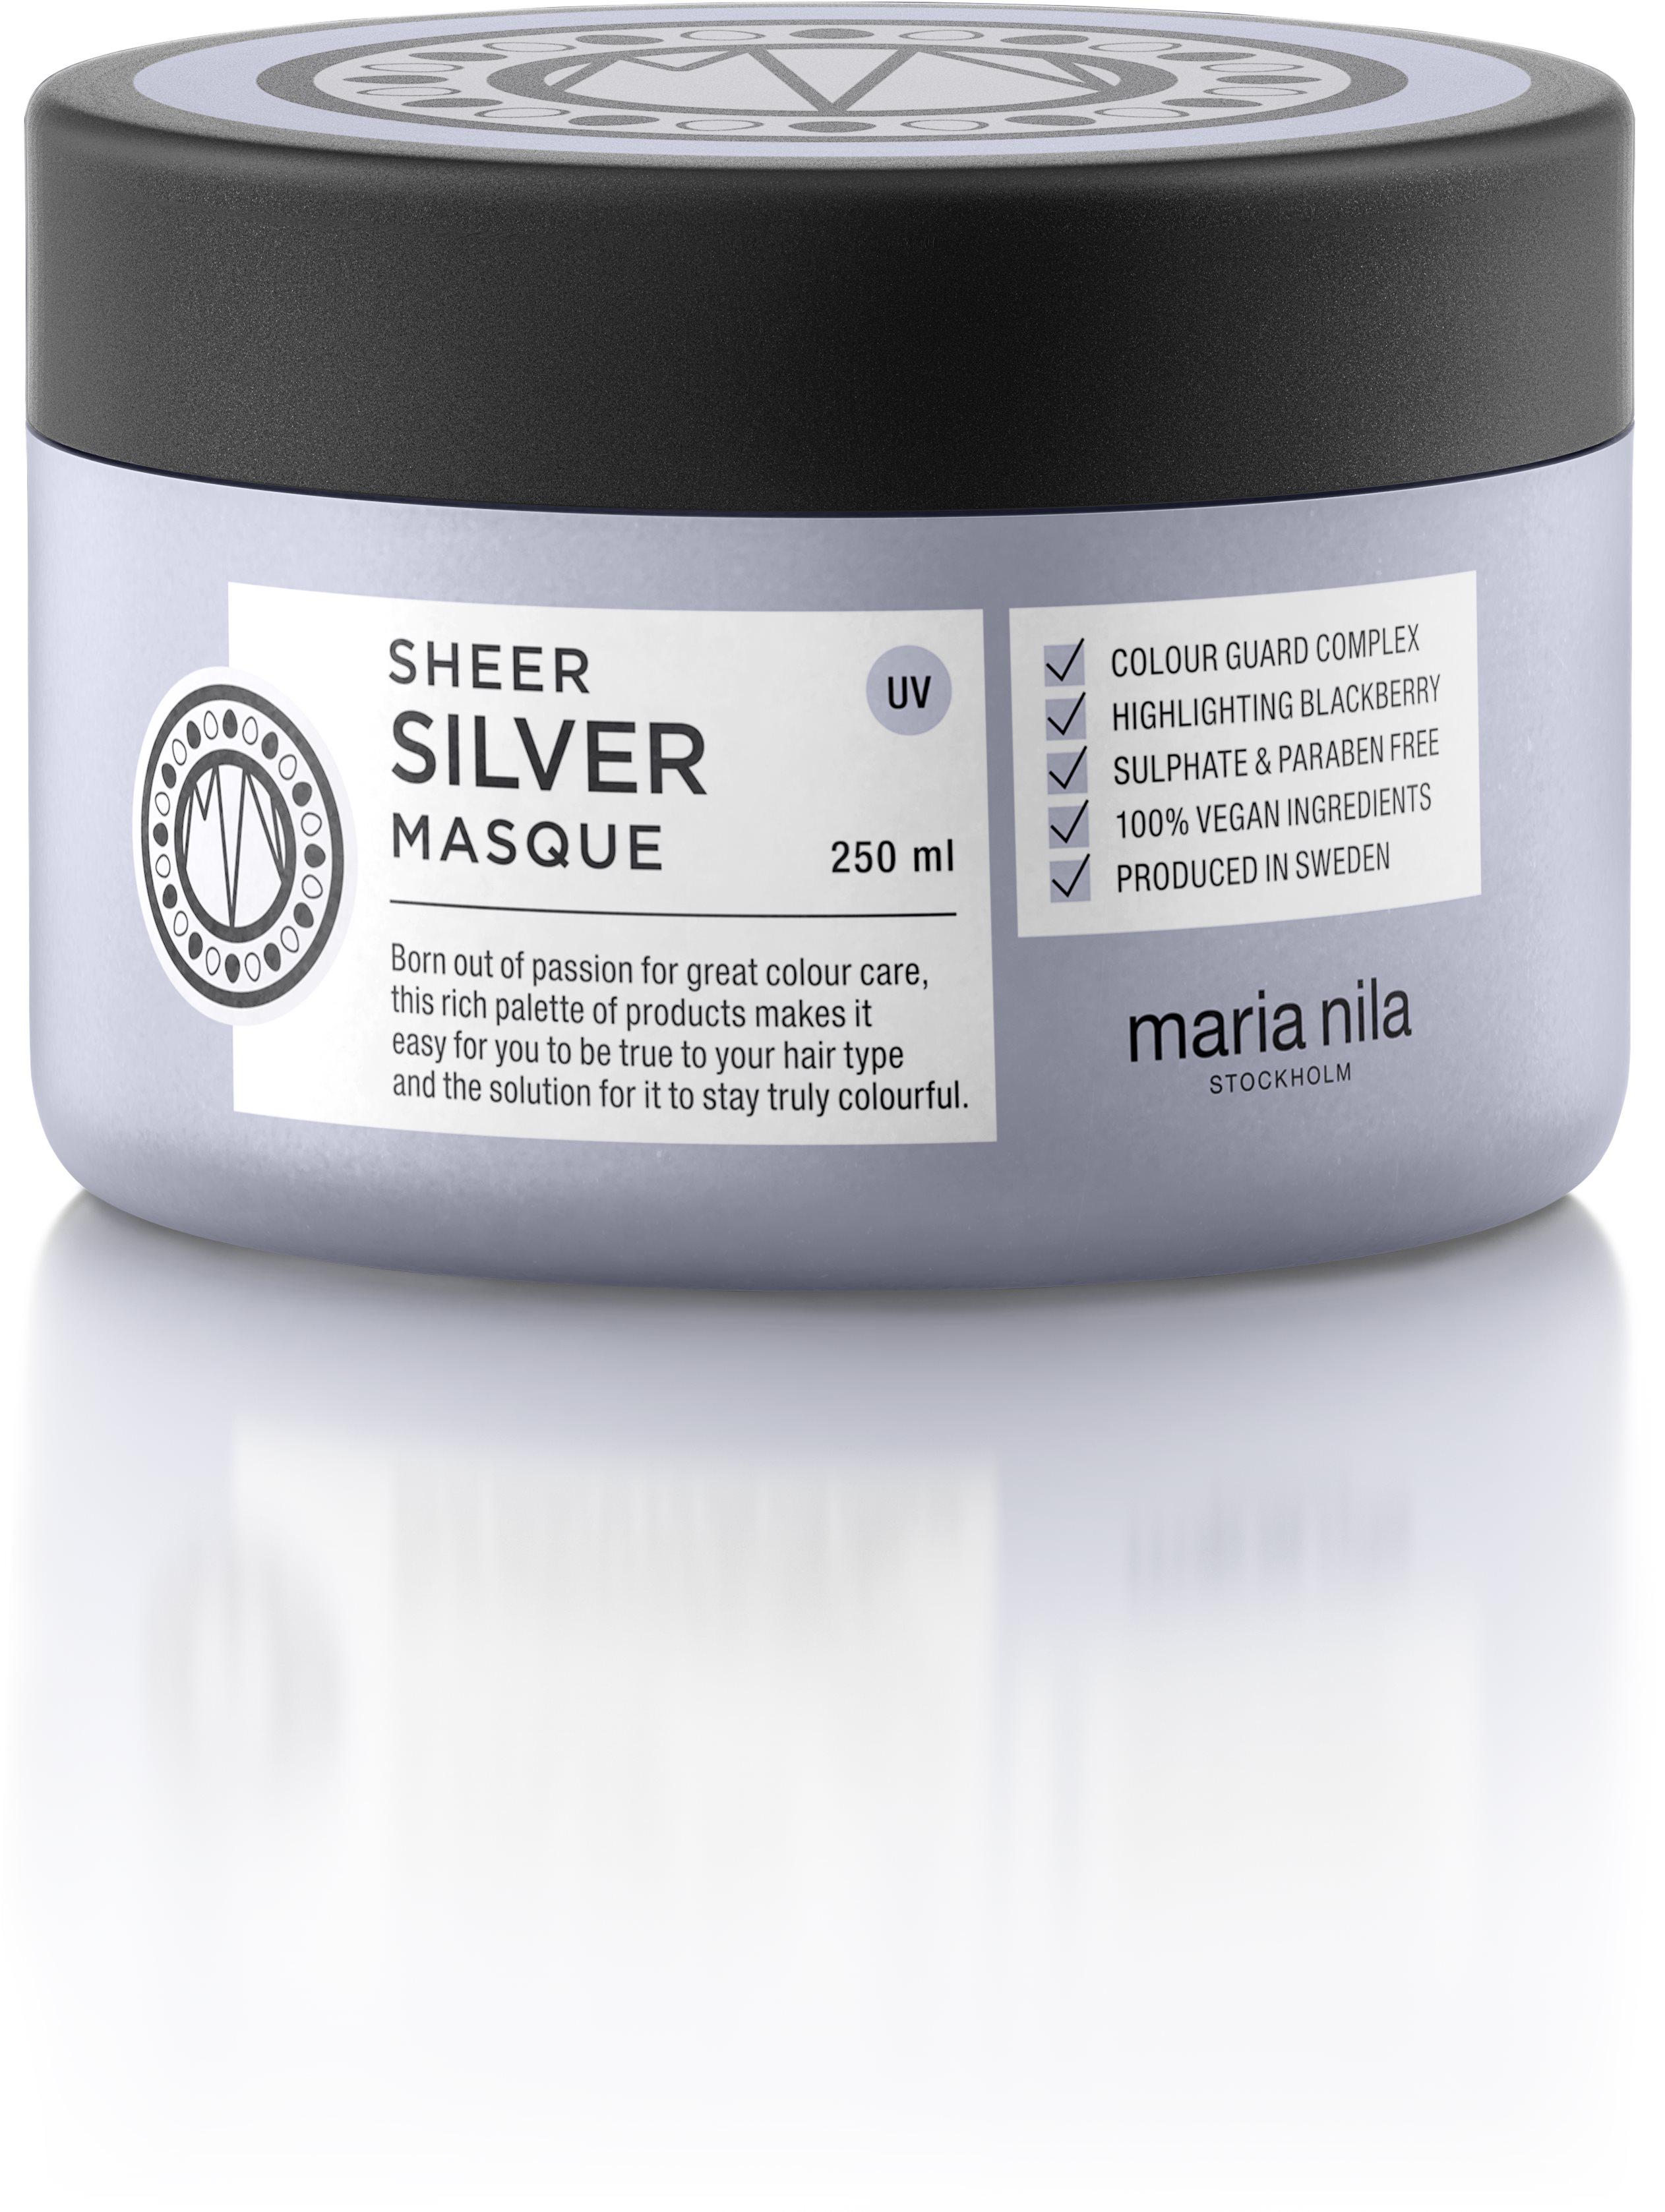 MARIA NILA Sheer Silver 250 ml